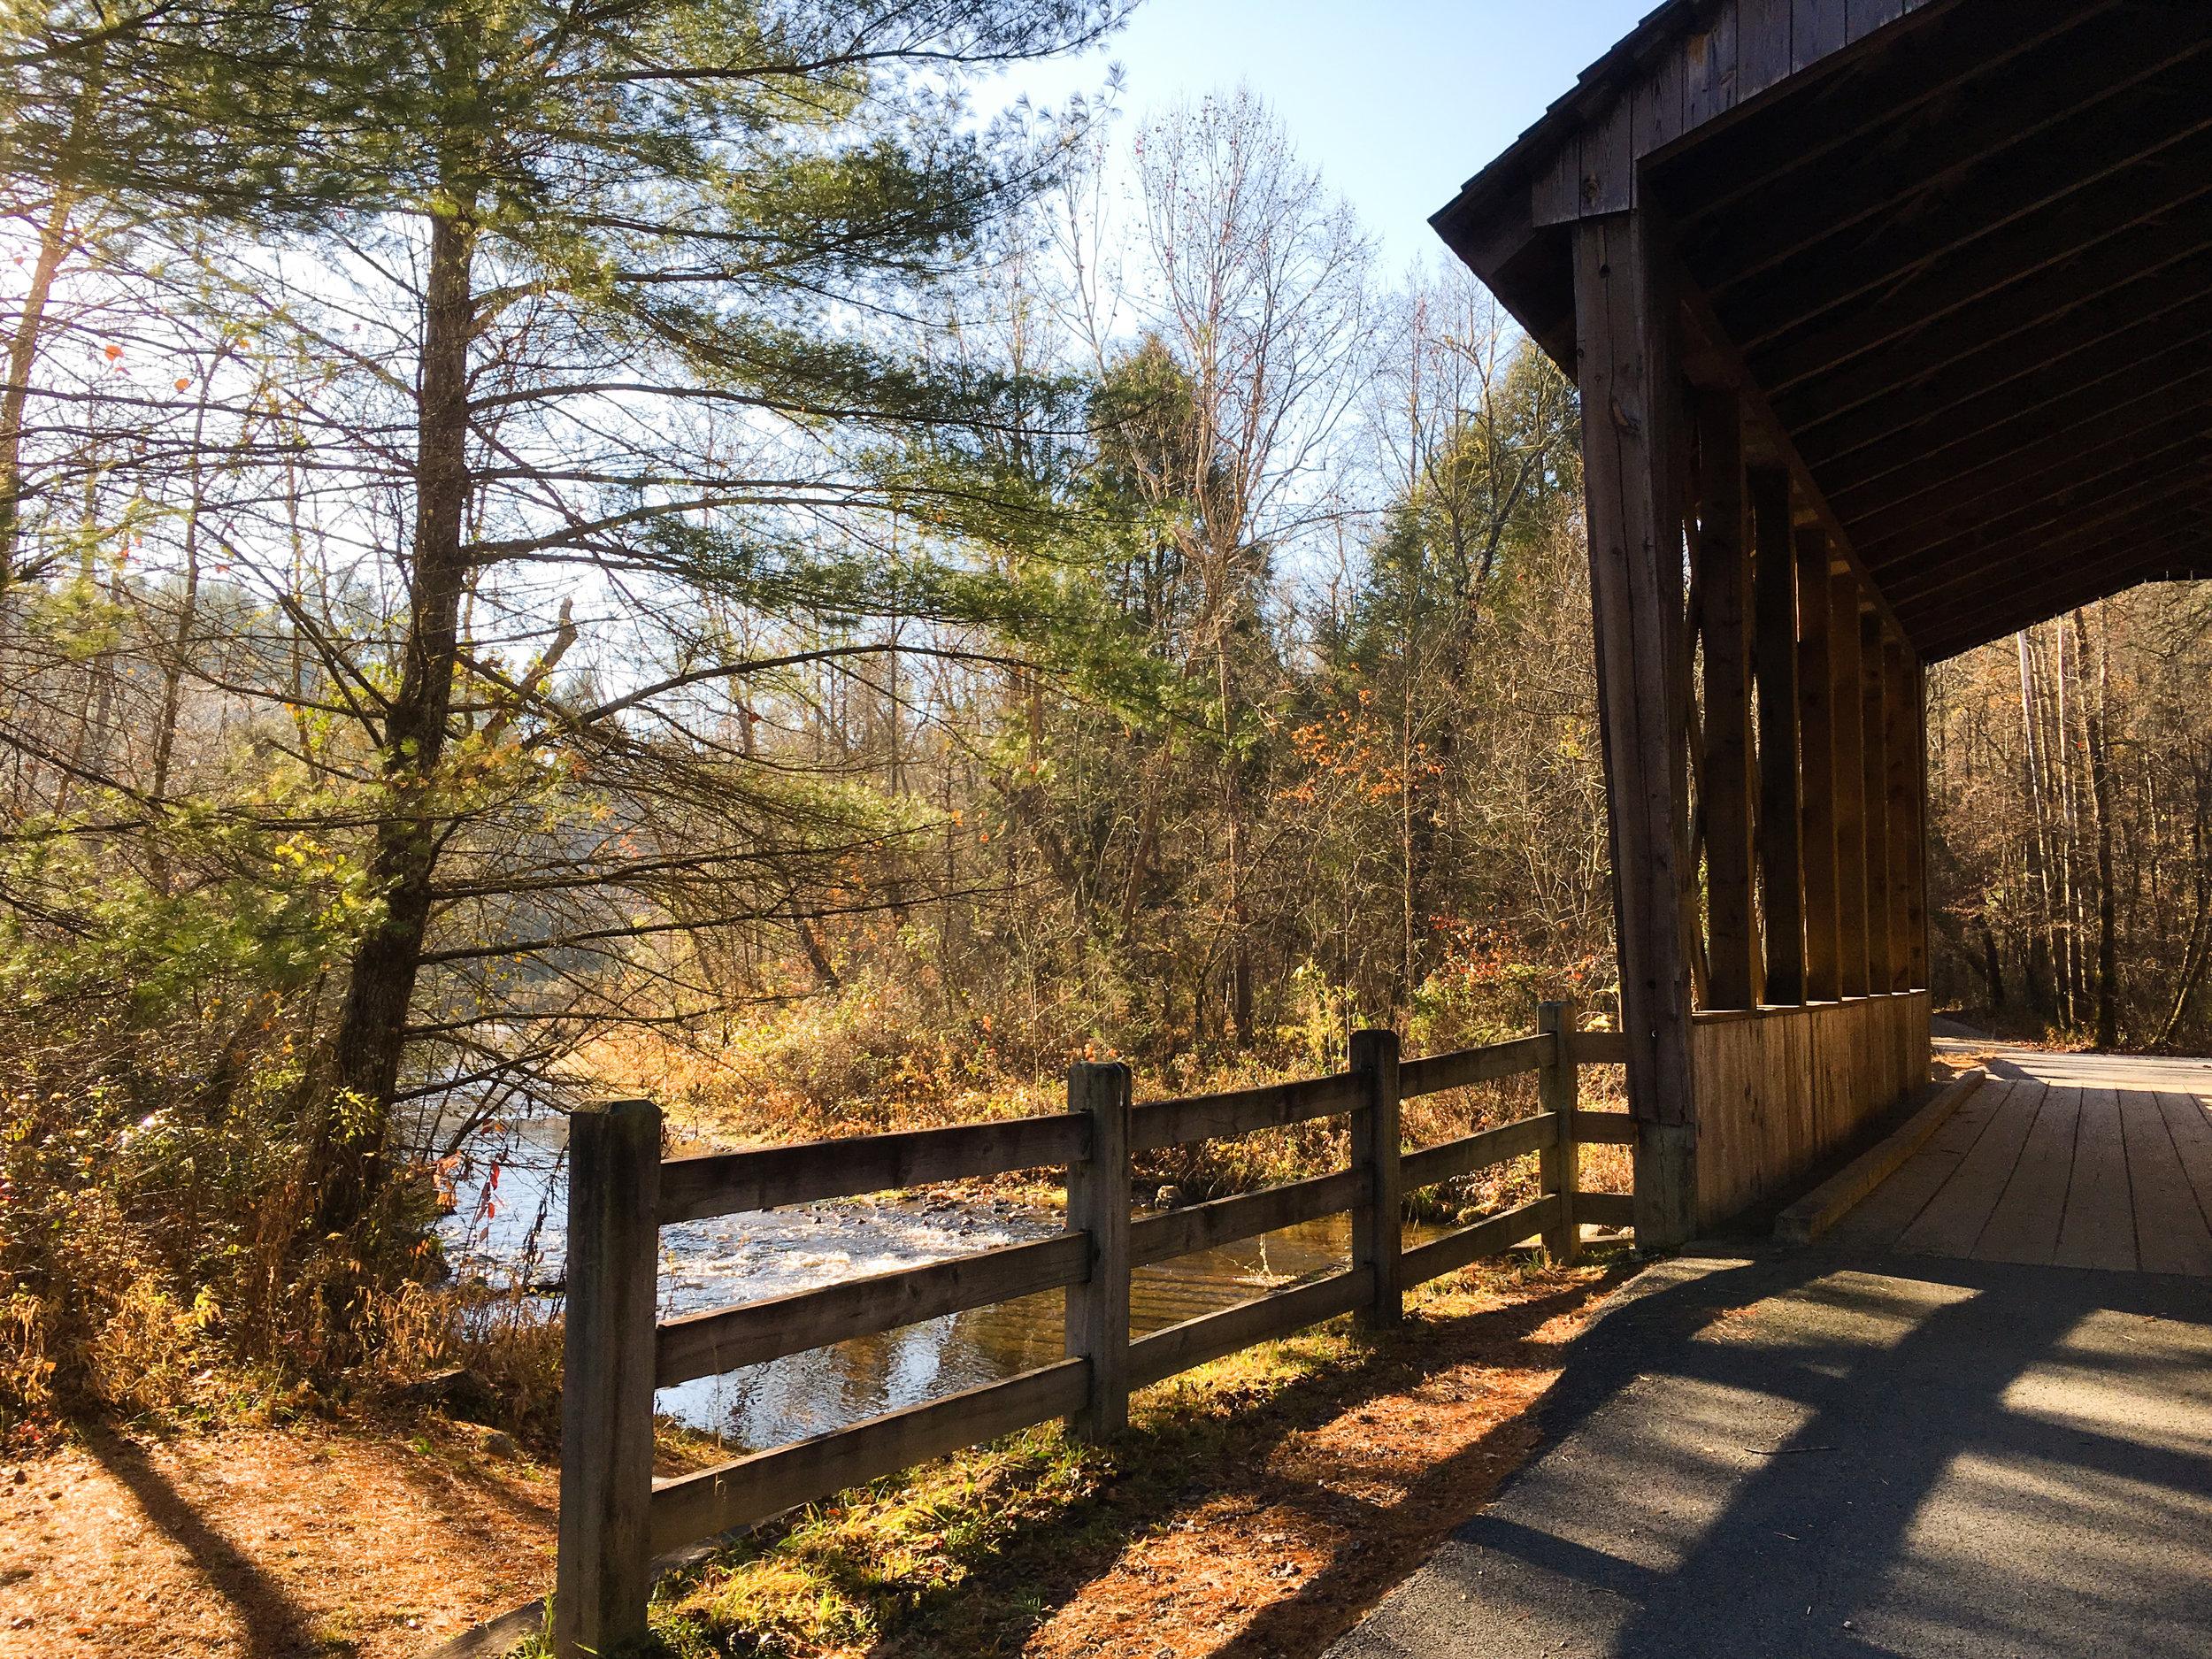 Covered bridge, November 24, 2017